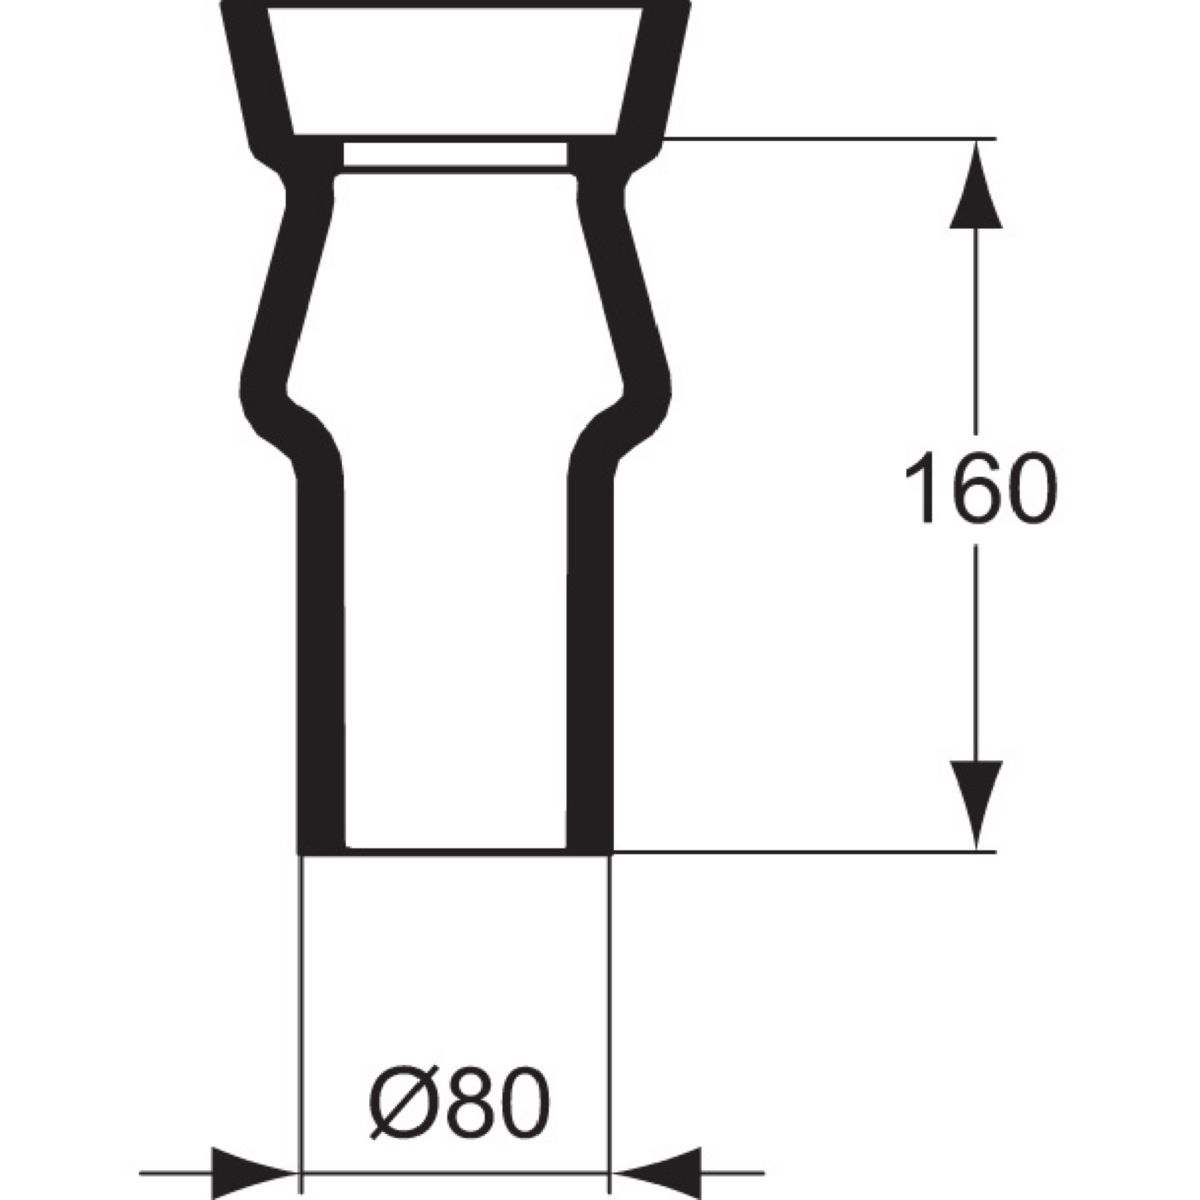 Tubulure spéciale ASPIRAMBO pipe courte, grès blanc réf. P286101